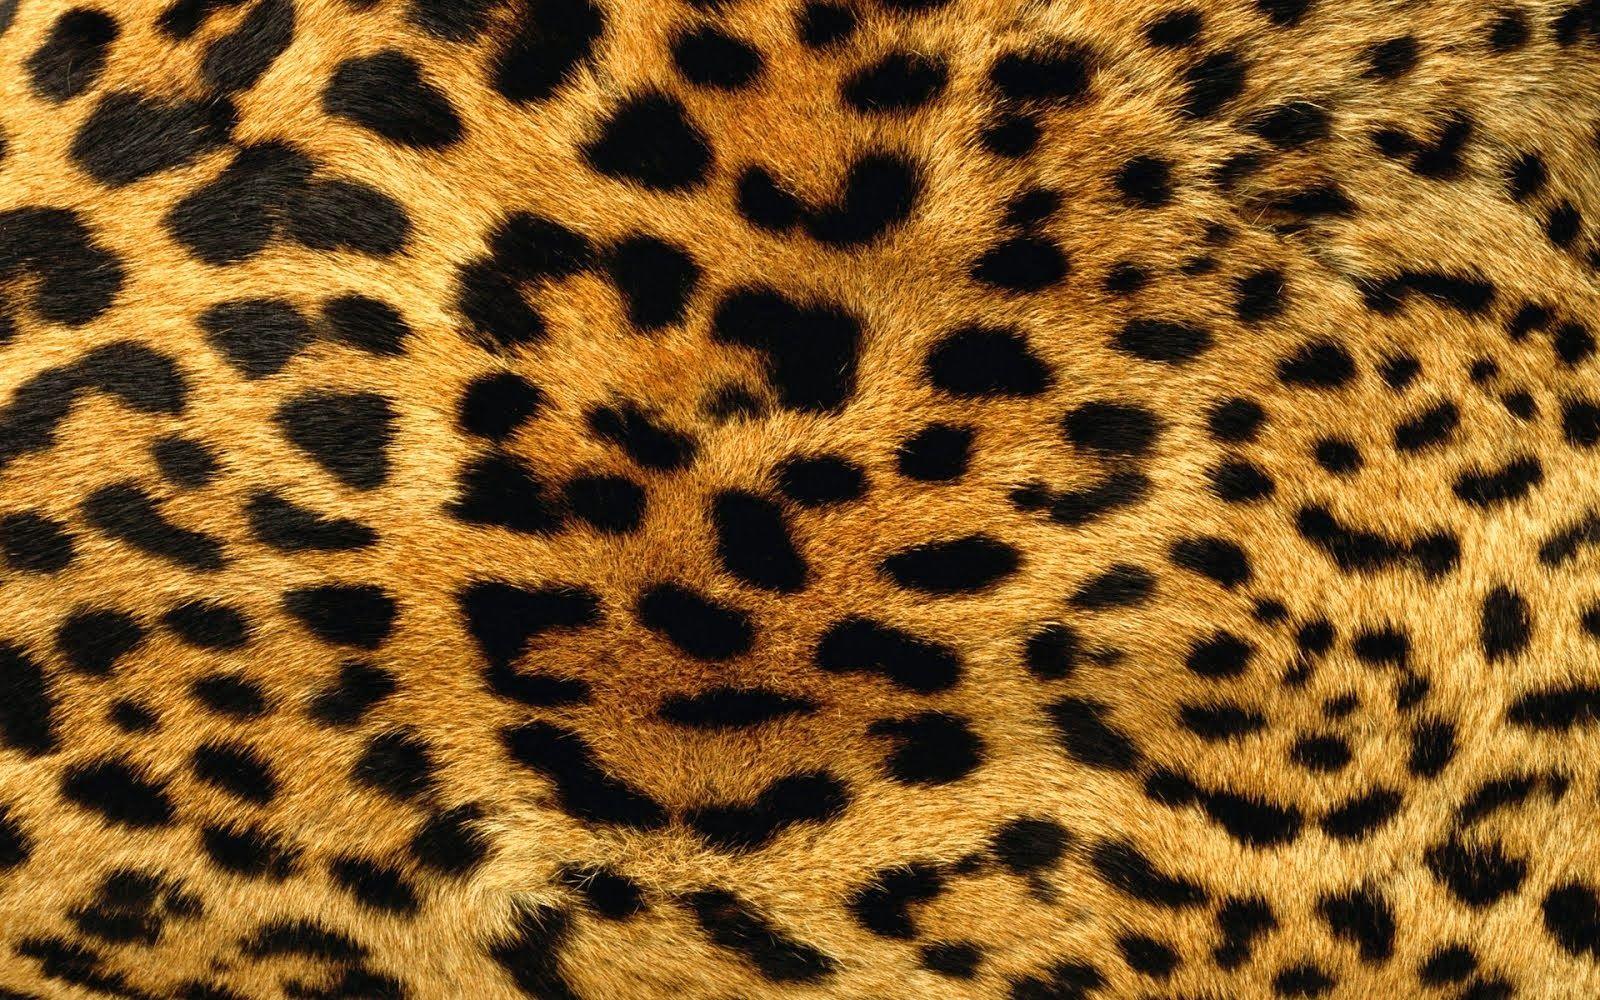 A Unique Wallpaper Design For Your Cheetah Print Wall